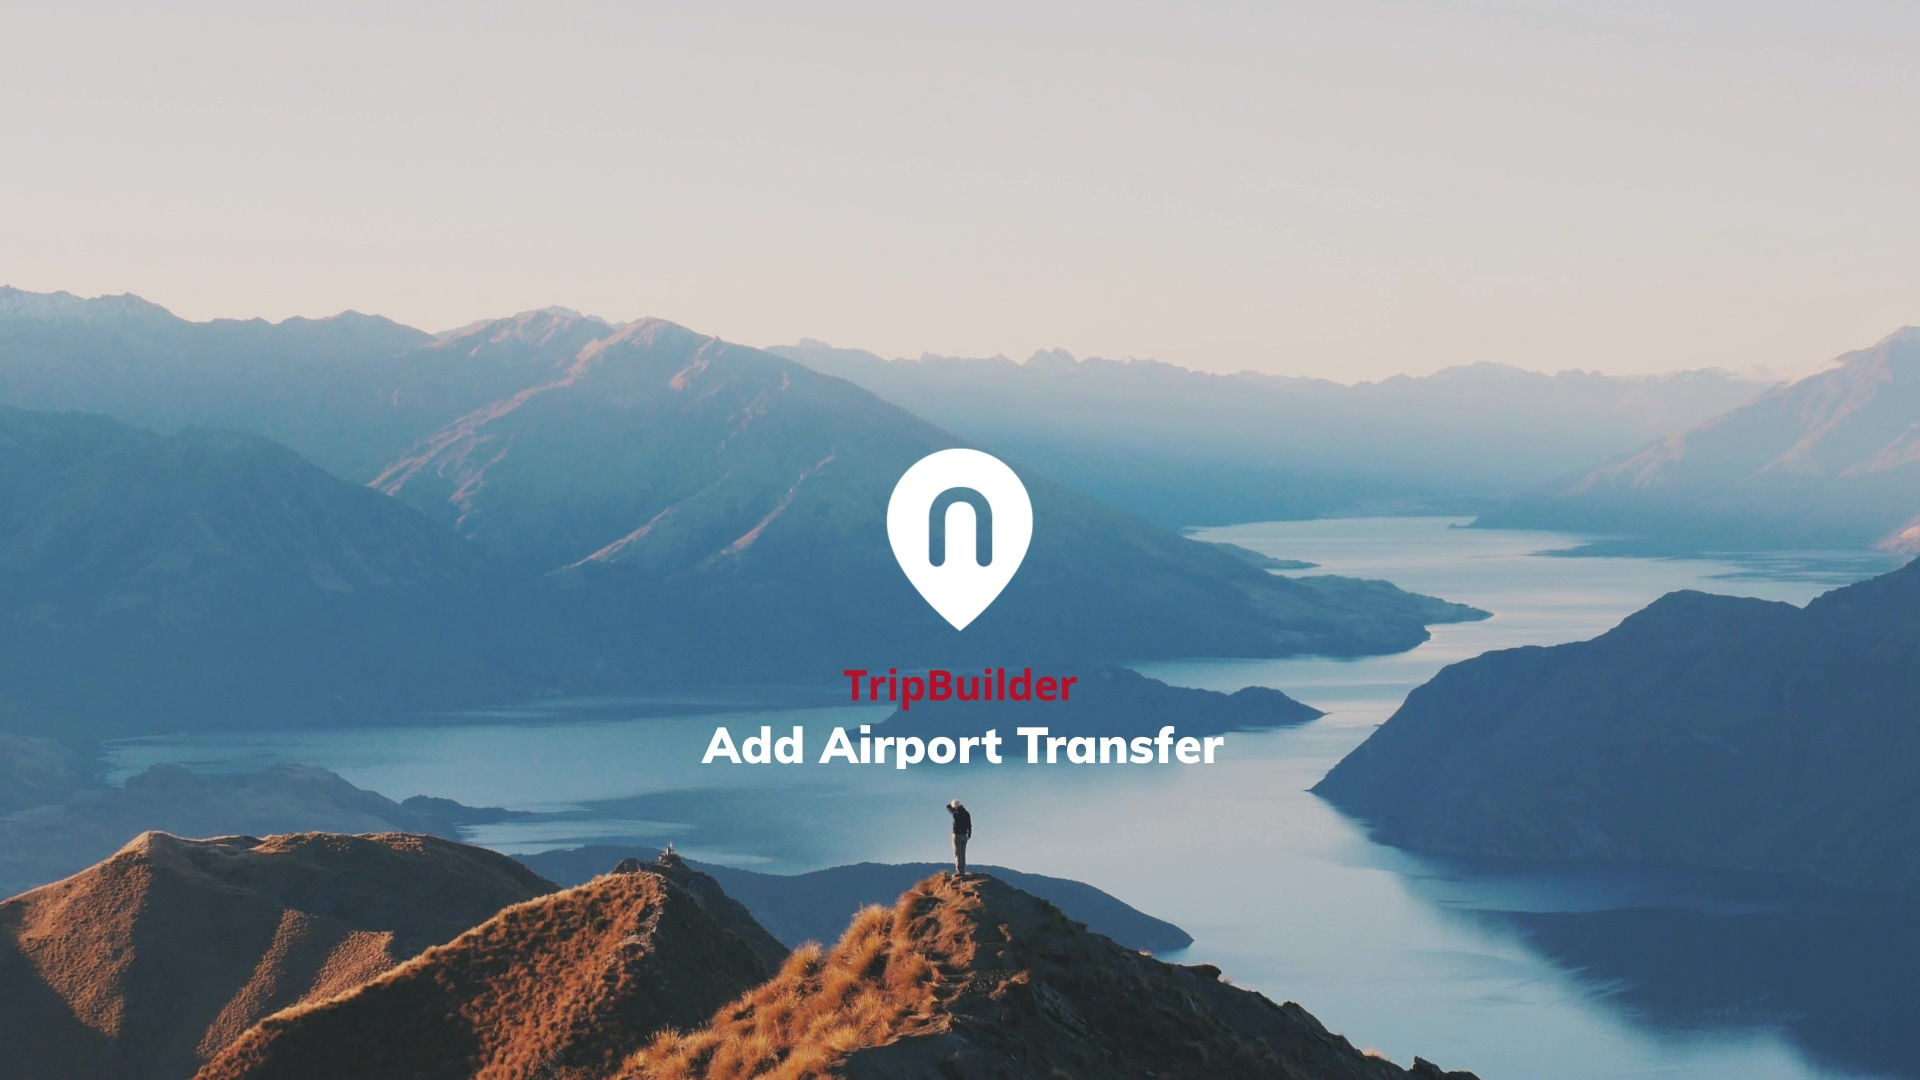 Add Airport Transfer 1080p